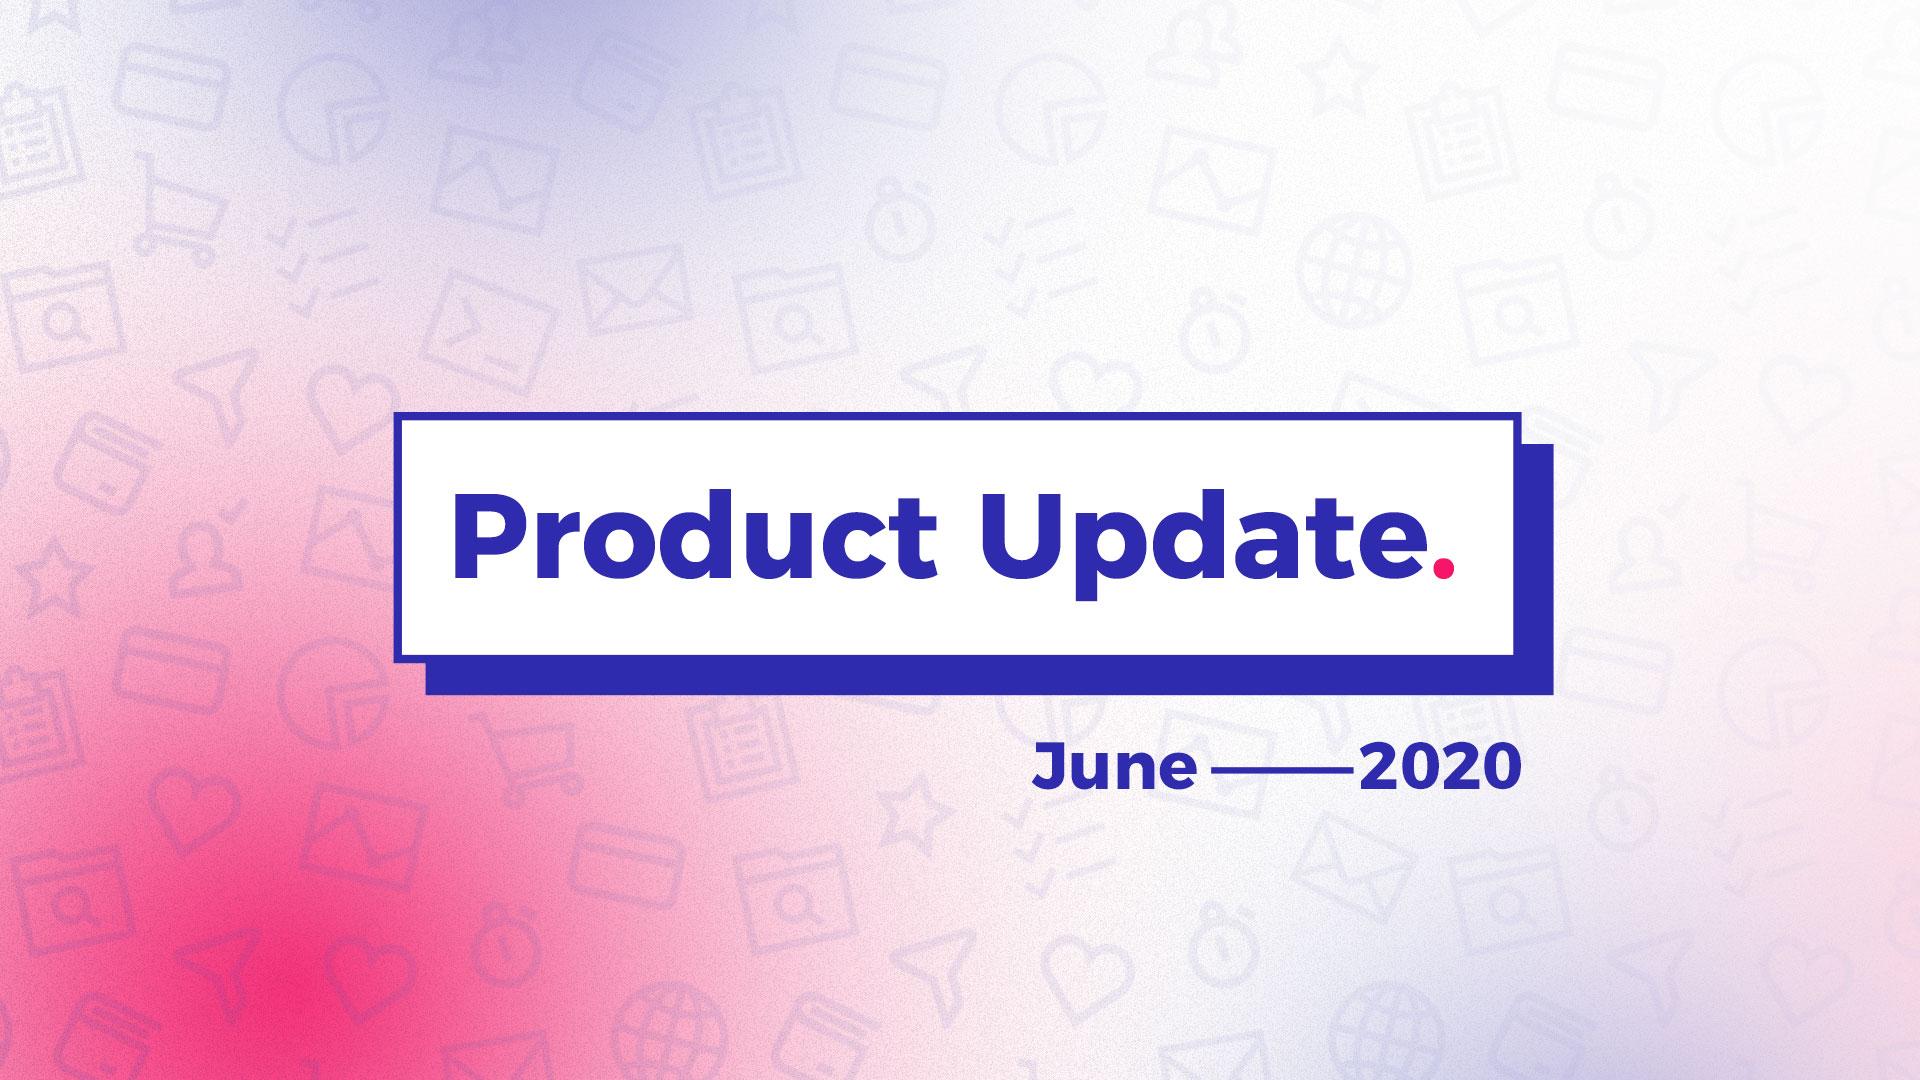 Viral Loops Product Update June 2020